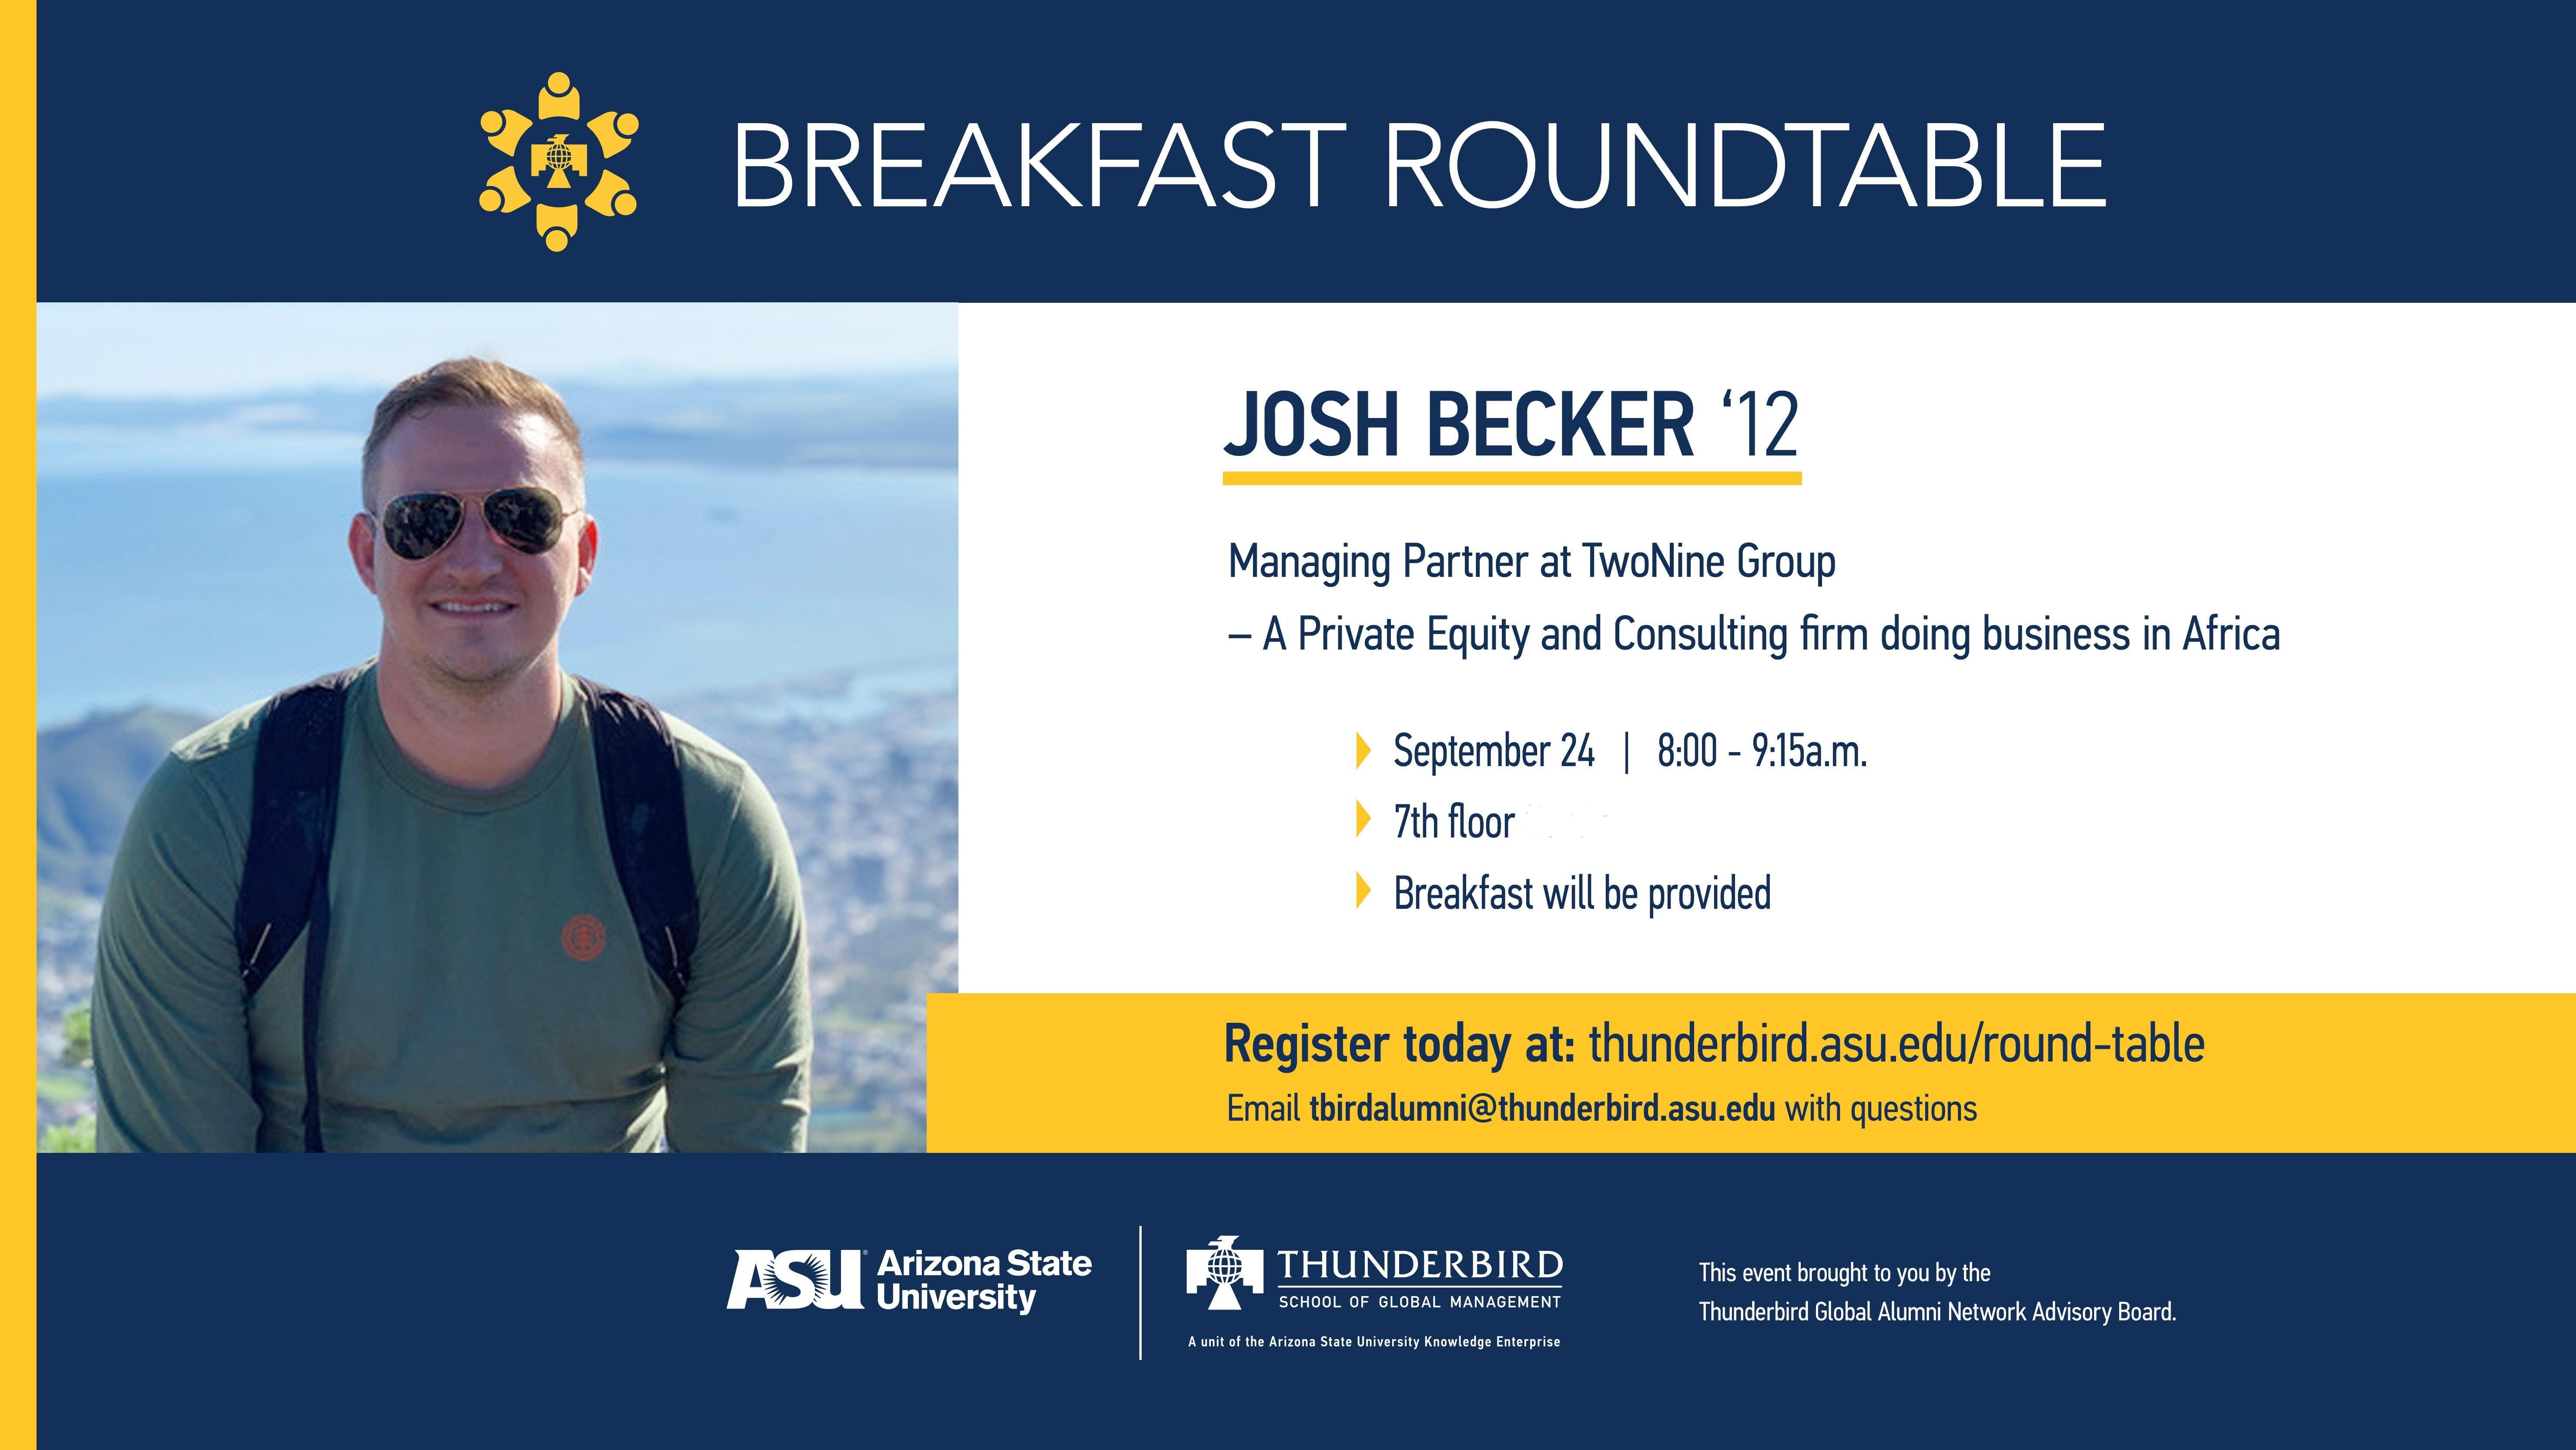 Breakfast Round-table with Josh Becker